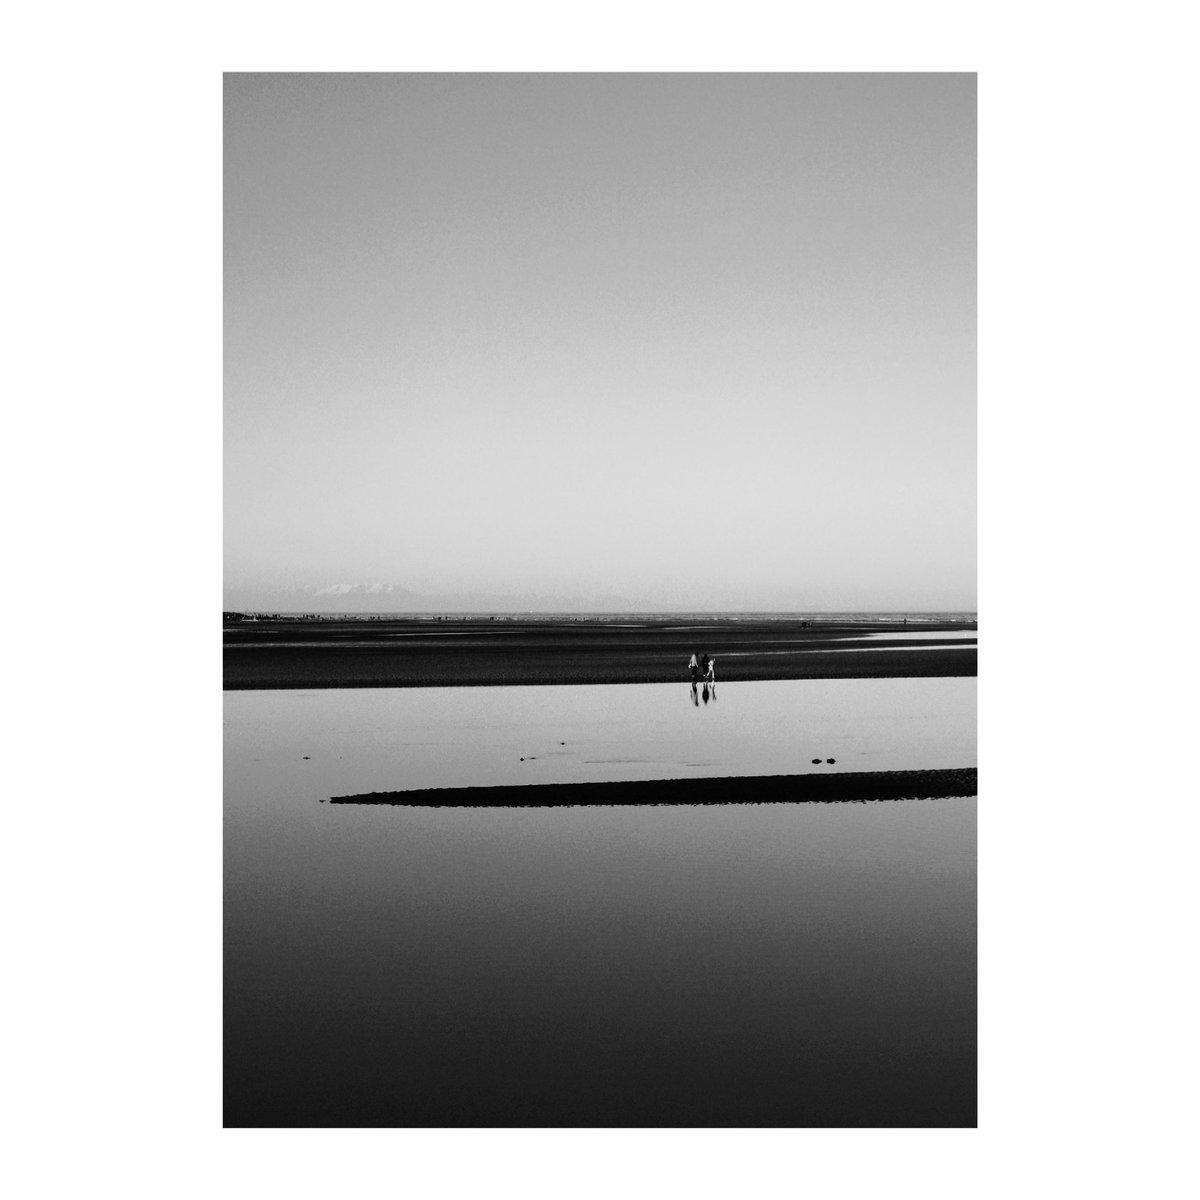 Flat Ink.   #picoftheday #photooftheday #whatitalyis #italy #italia #albarella #veneto #igersitalia #fujifilm #fujifilm_xseries